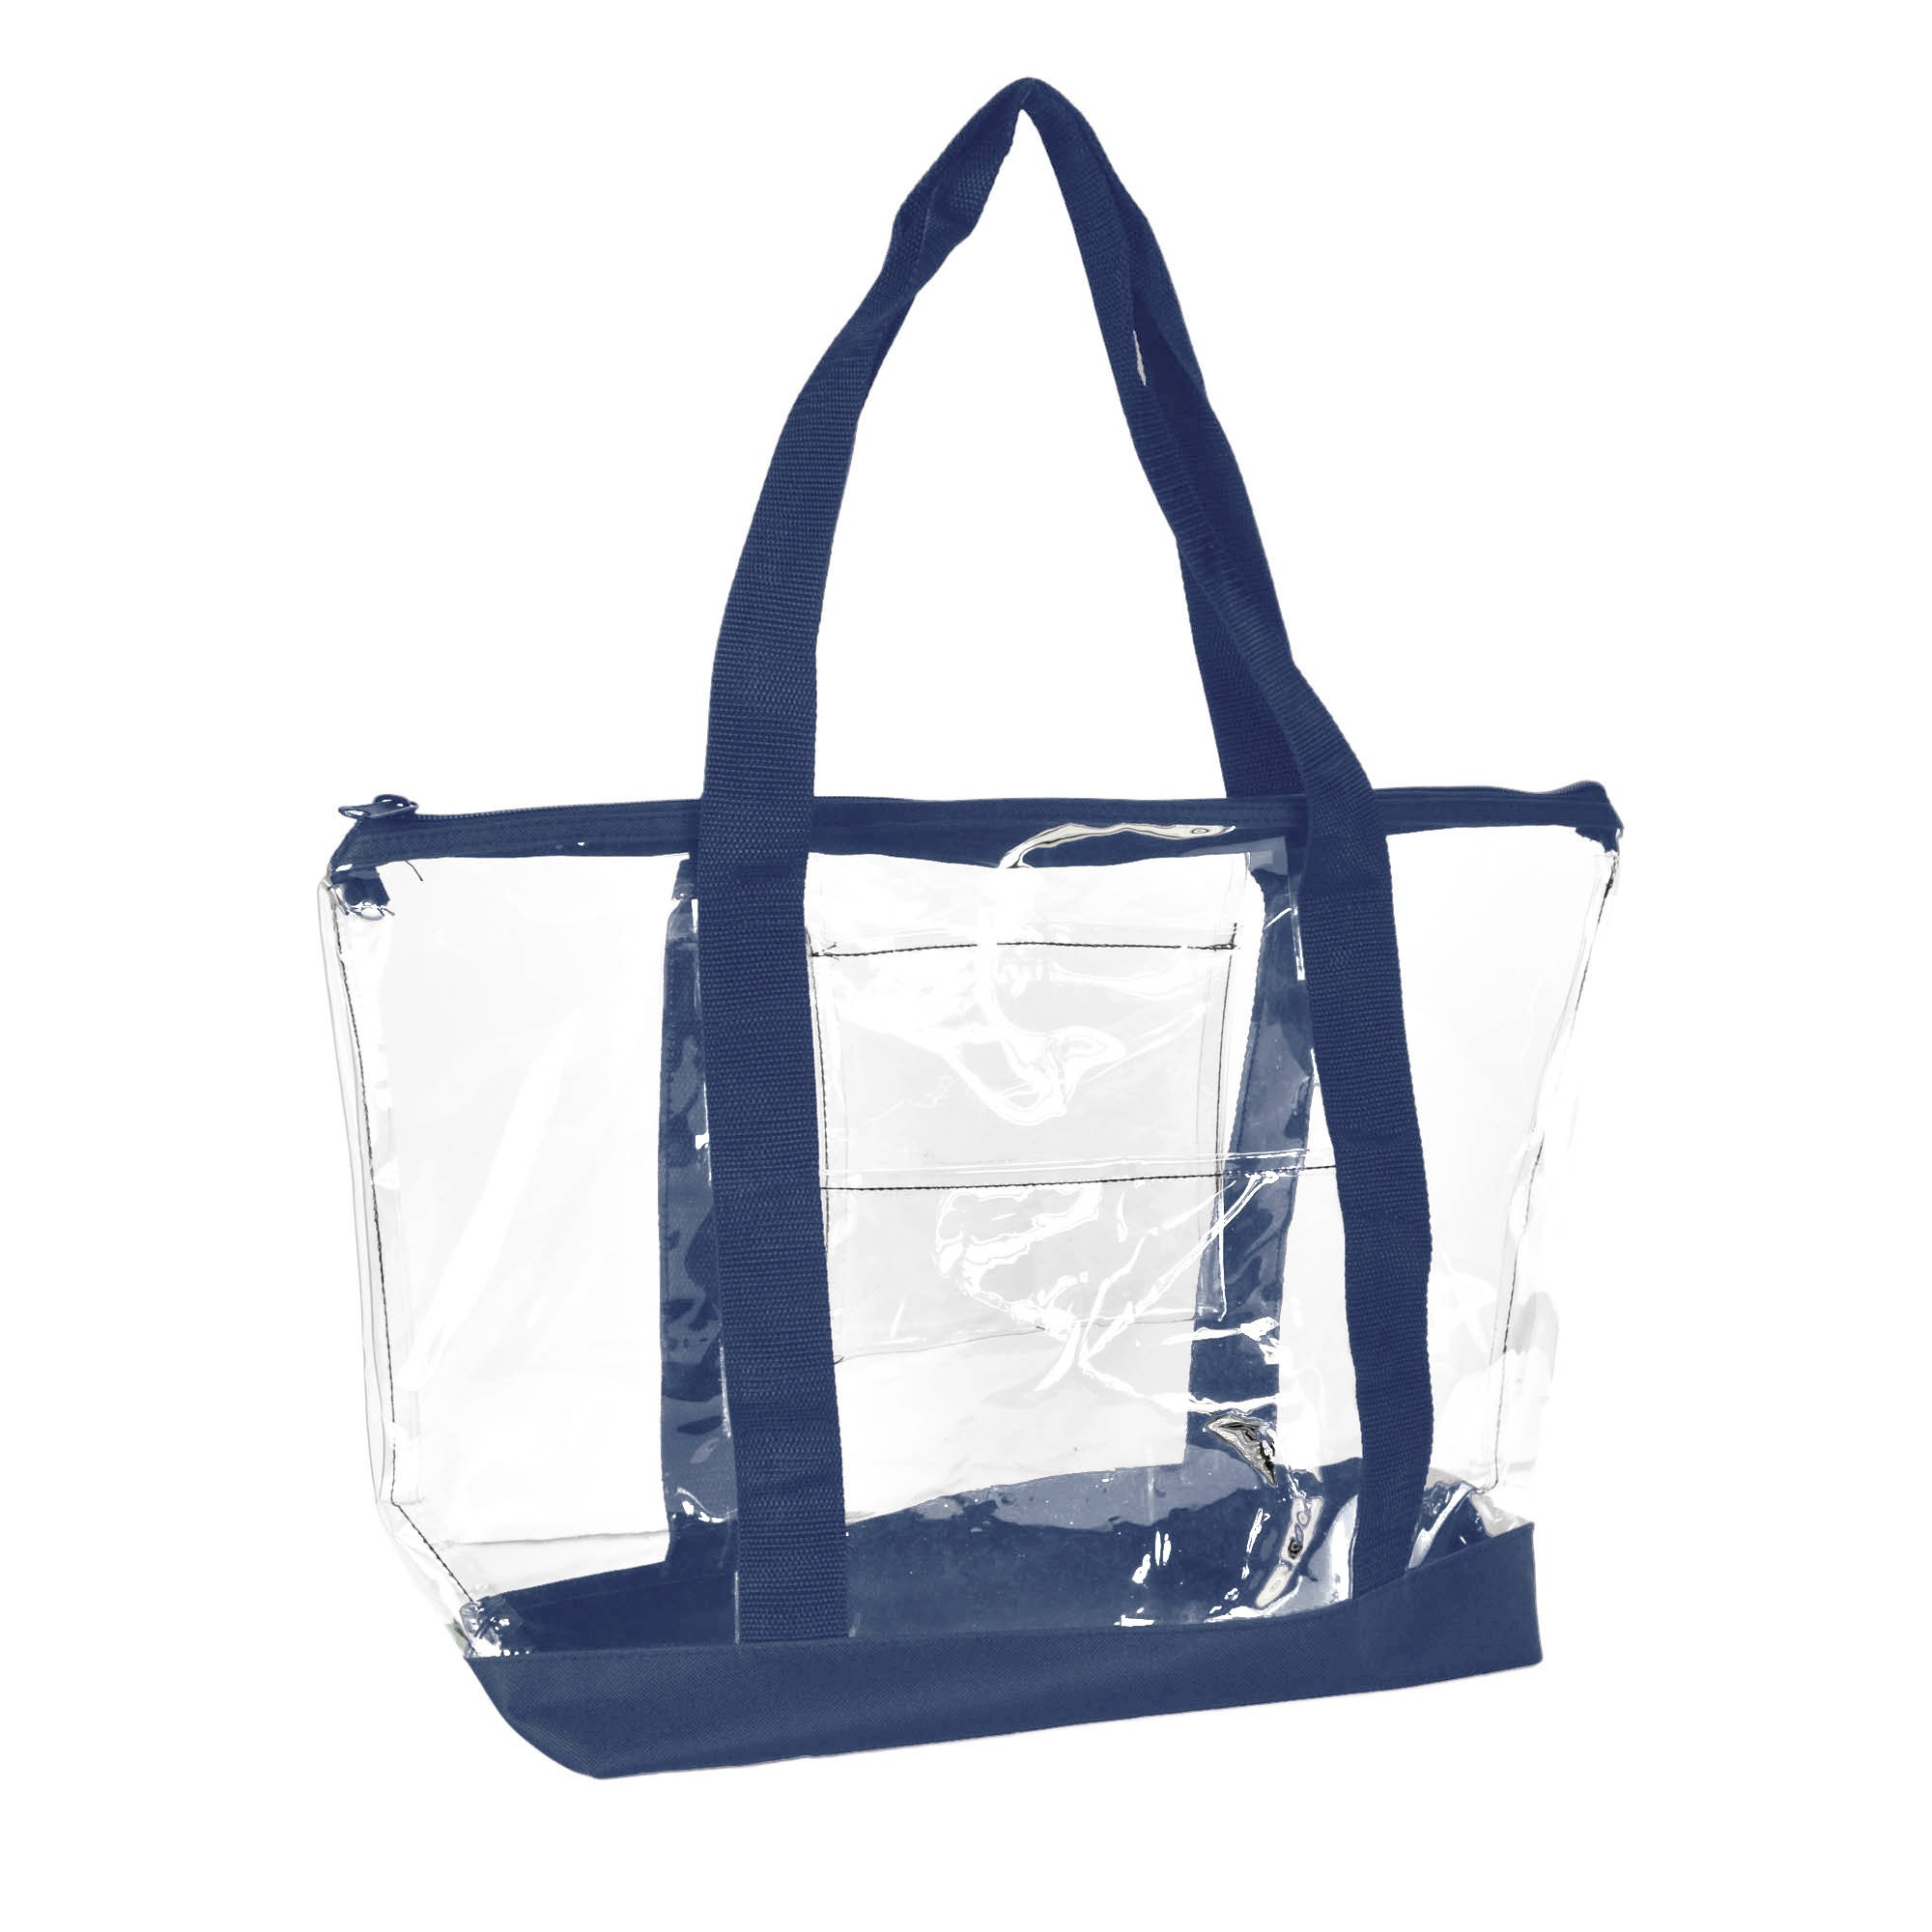 DALIX Clear Shopping Bag Security Work Tote Shoulder Bag Womens Handbag (Navy Blue) by DALIX (Image #1)